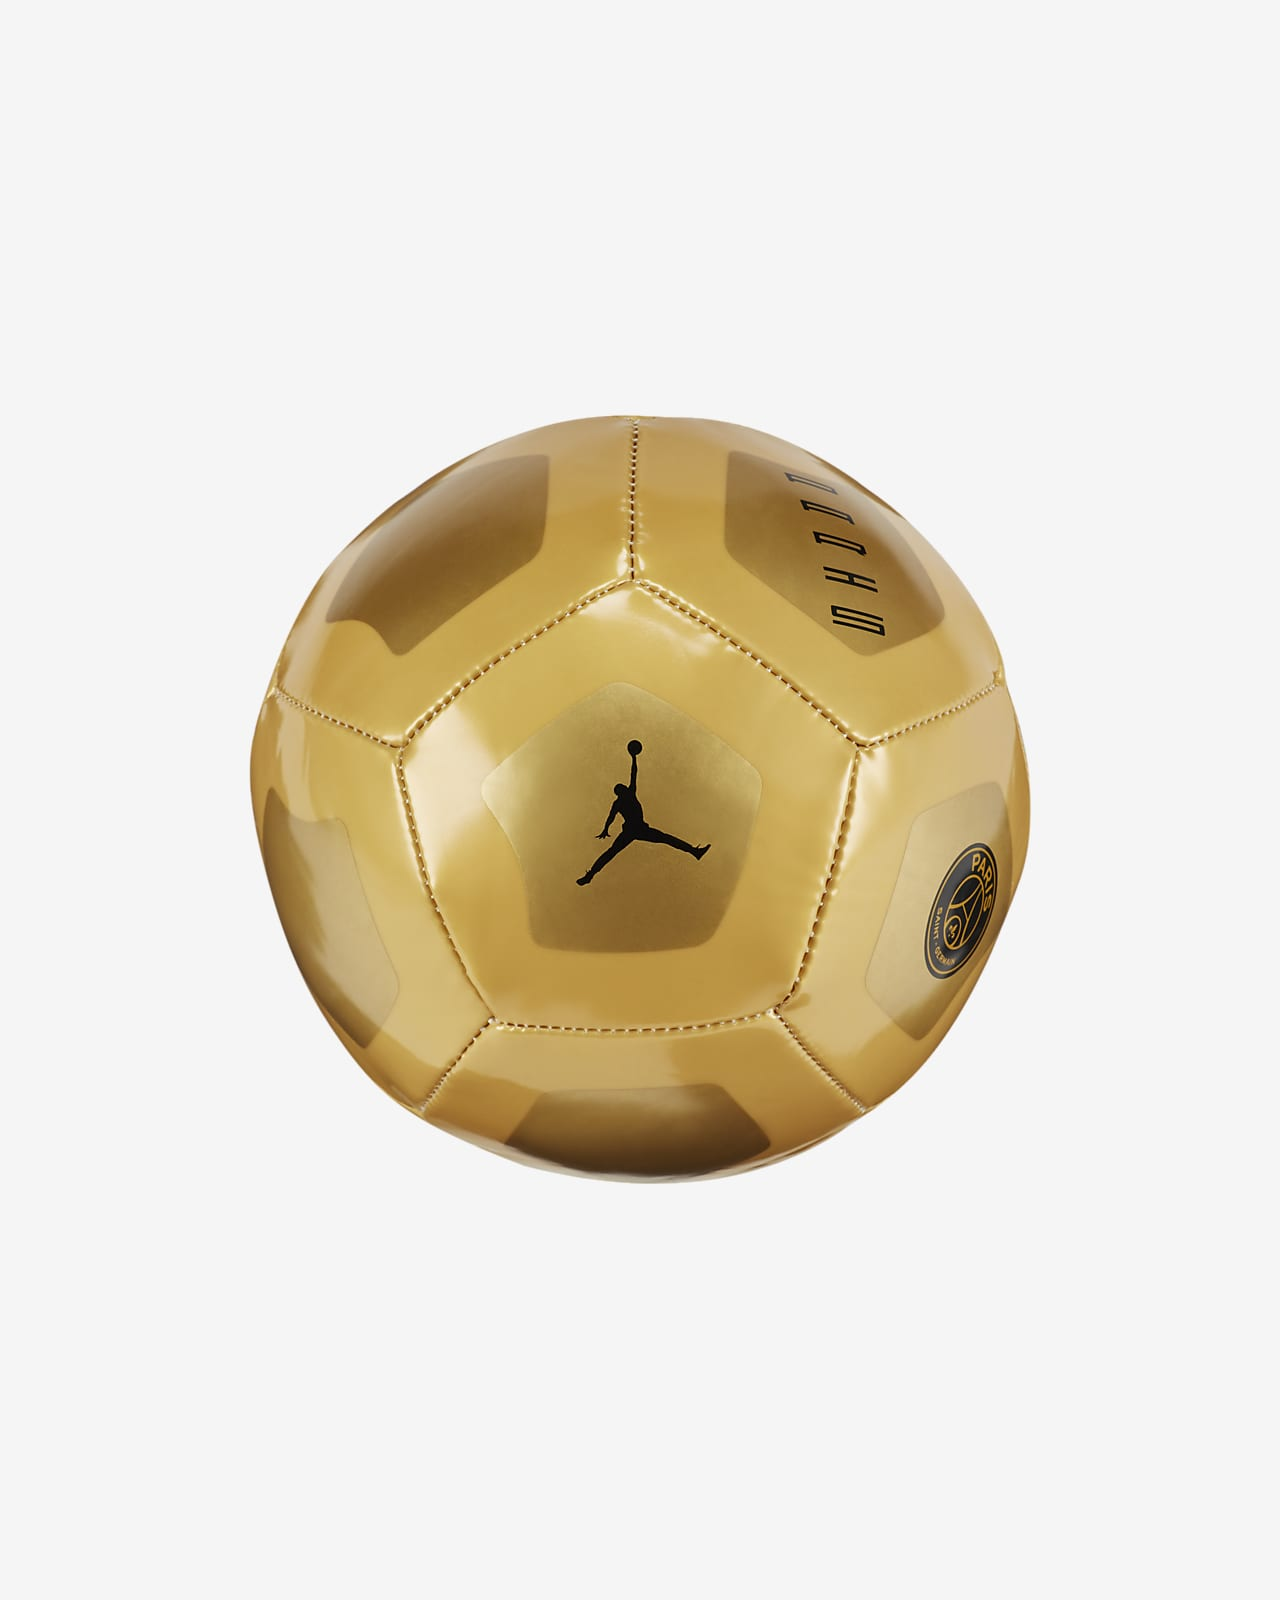 巴黎圣日耳曼 Skills 足球